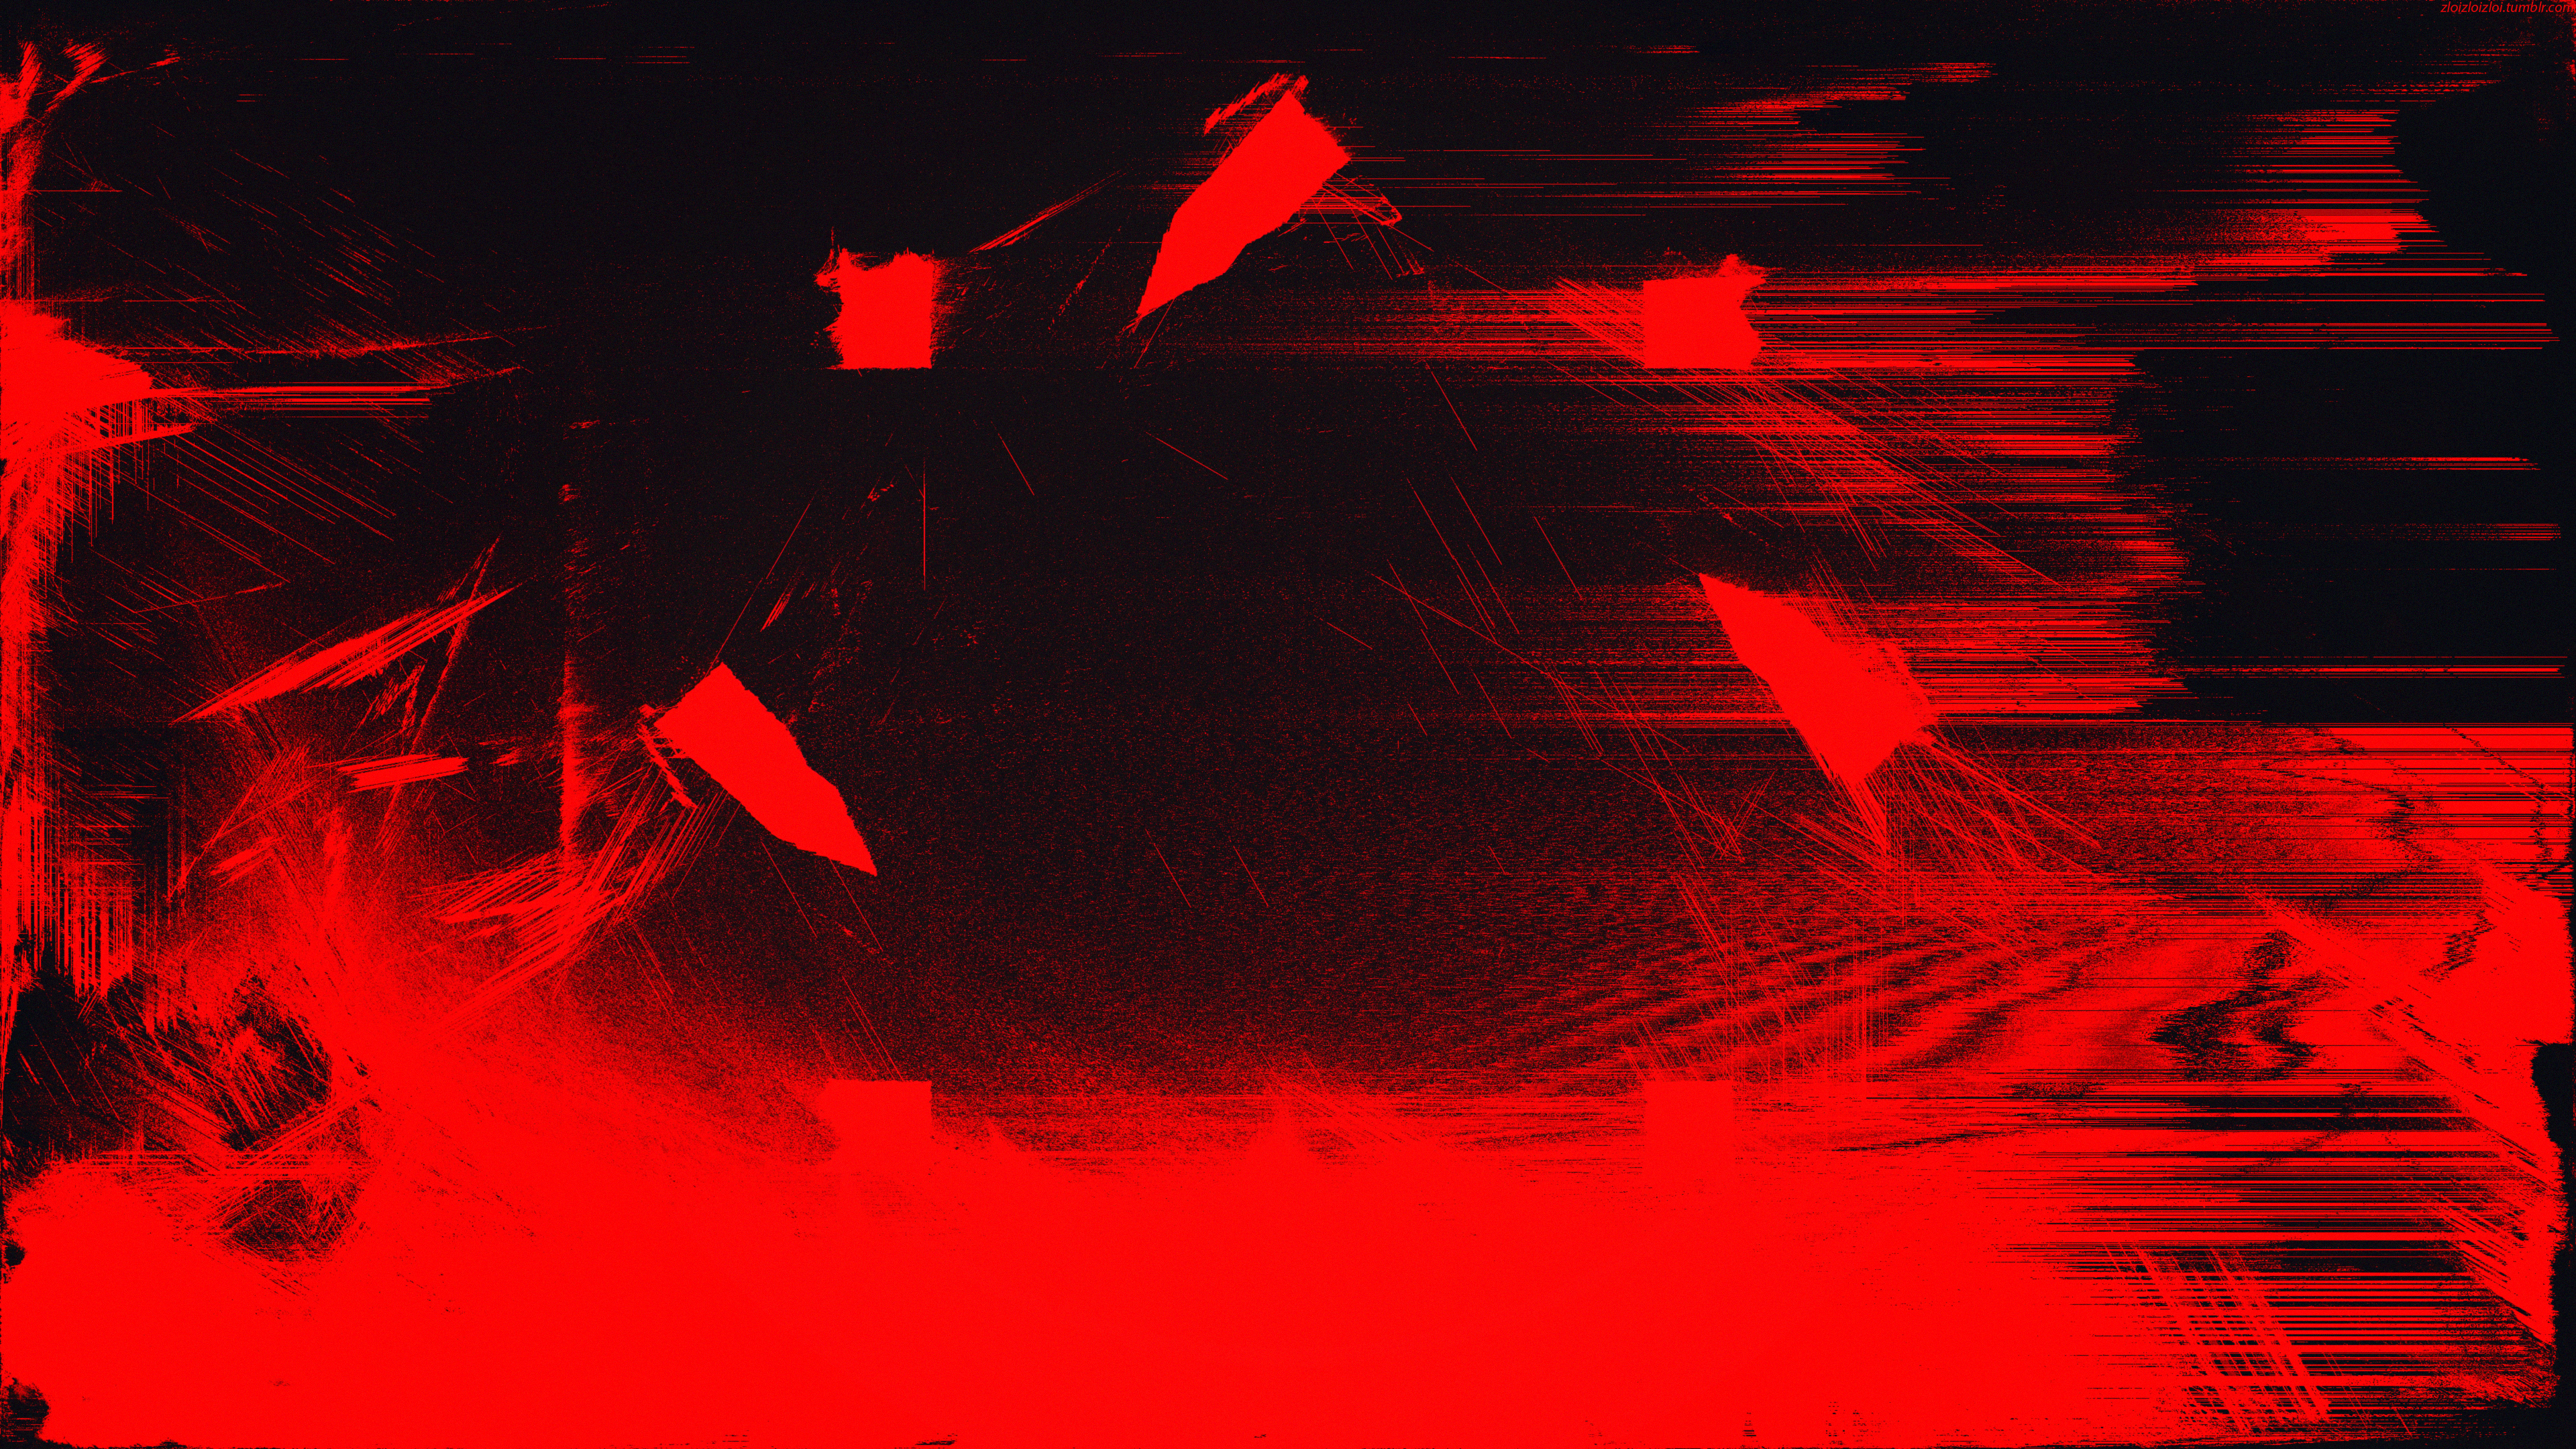 red-glitch-art-abstract-4k-2q.jpg